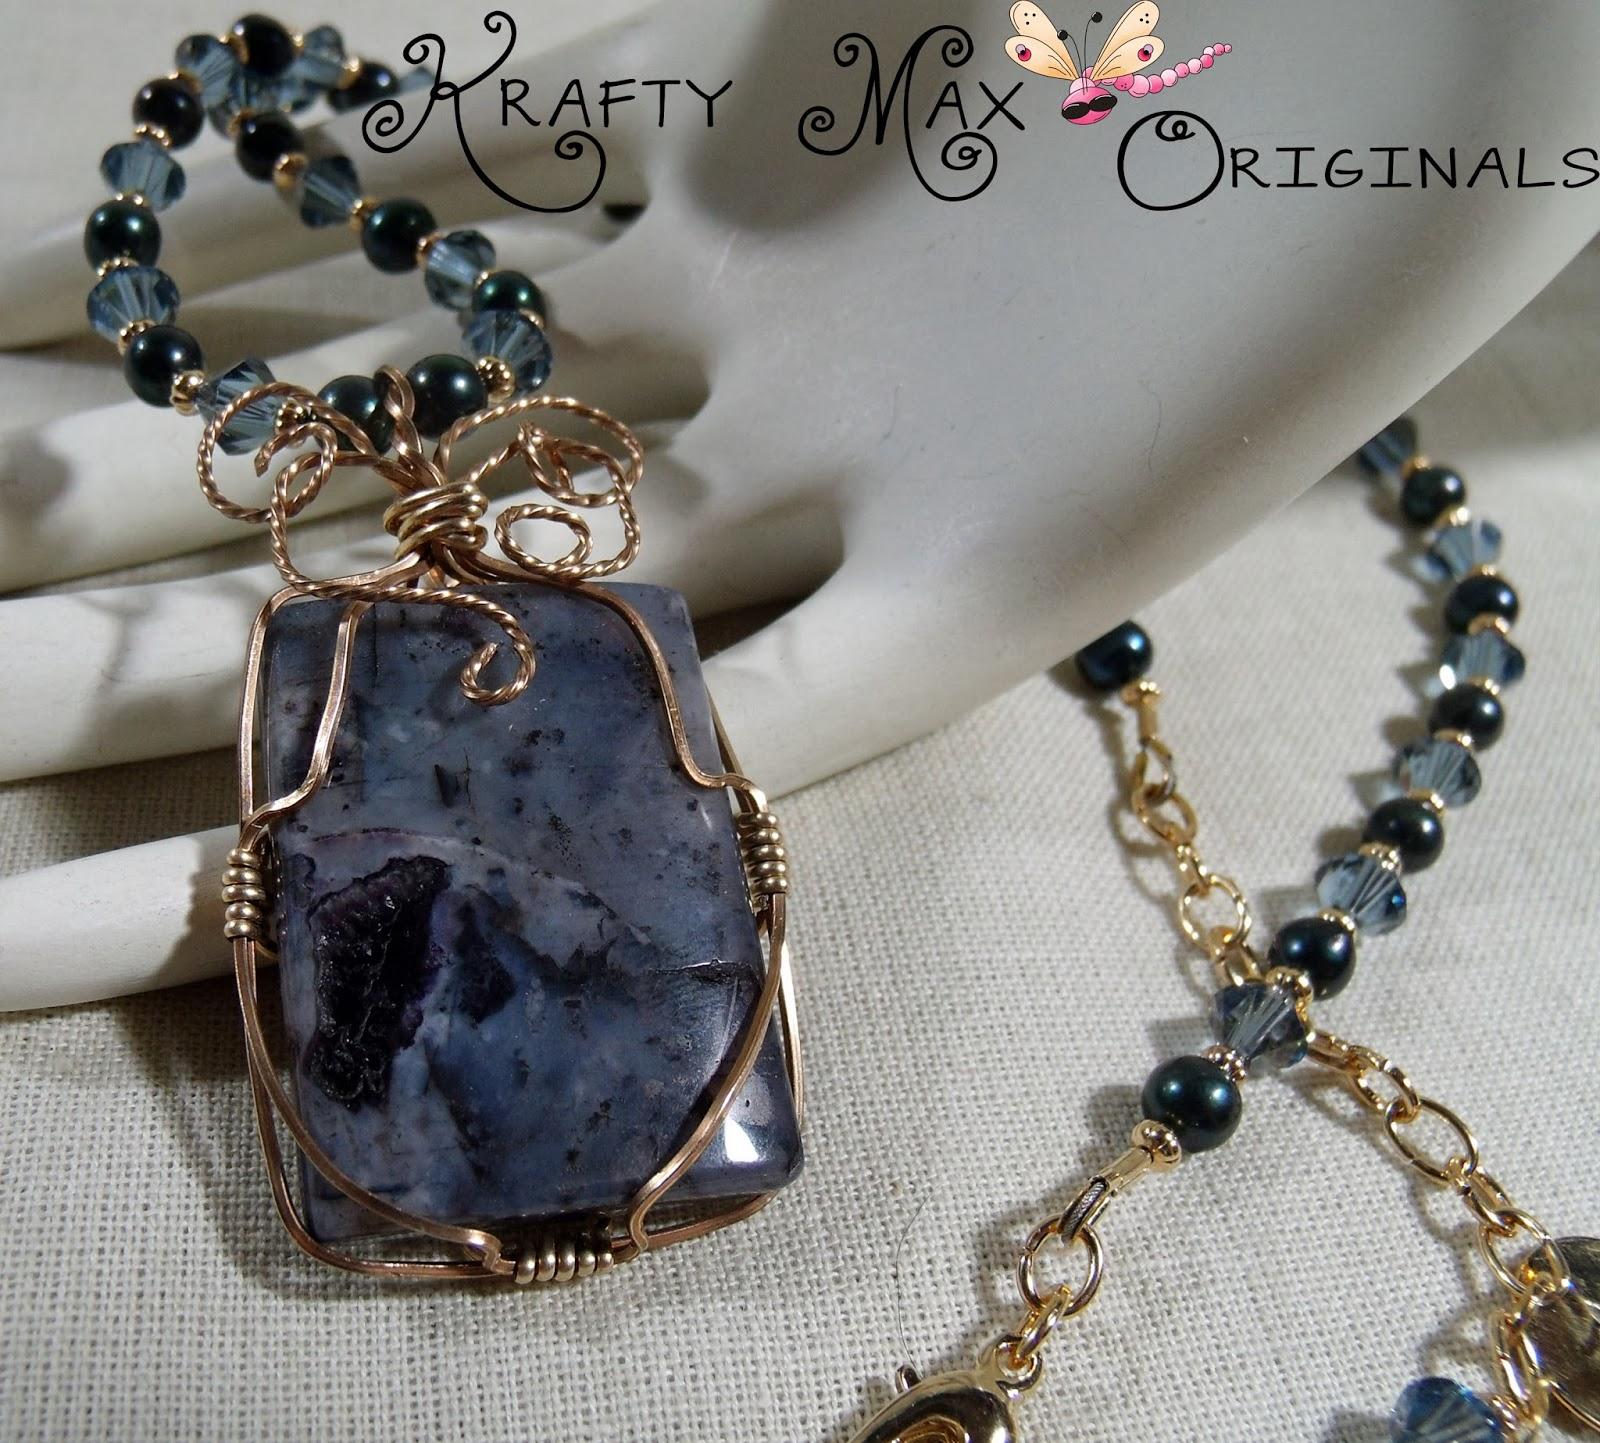 http://www.artfire.com/ext/shop/product_view/KraftyMax/8442337/swarovski_crystals_swarovski_pearls_and_blue_lapis_necklace_set/handmade/jewelry/sets/crystal